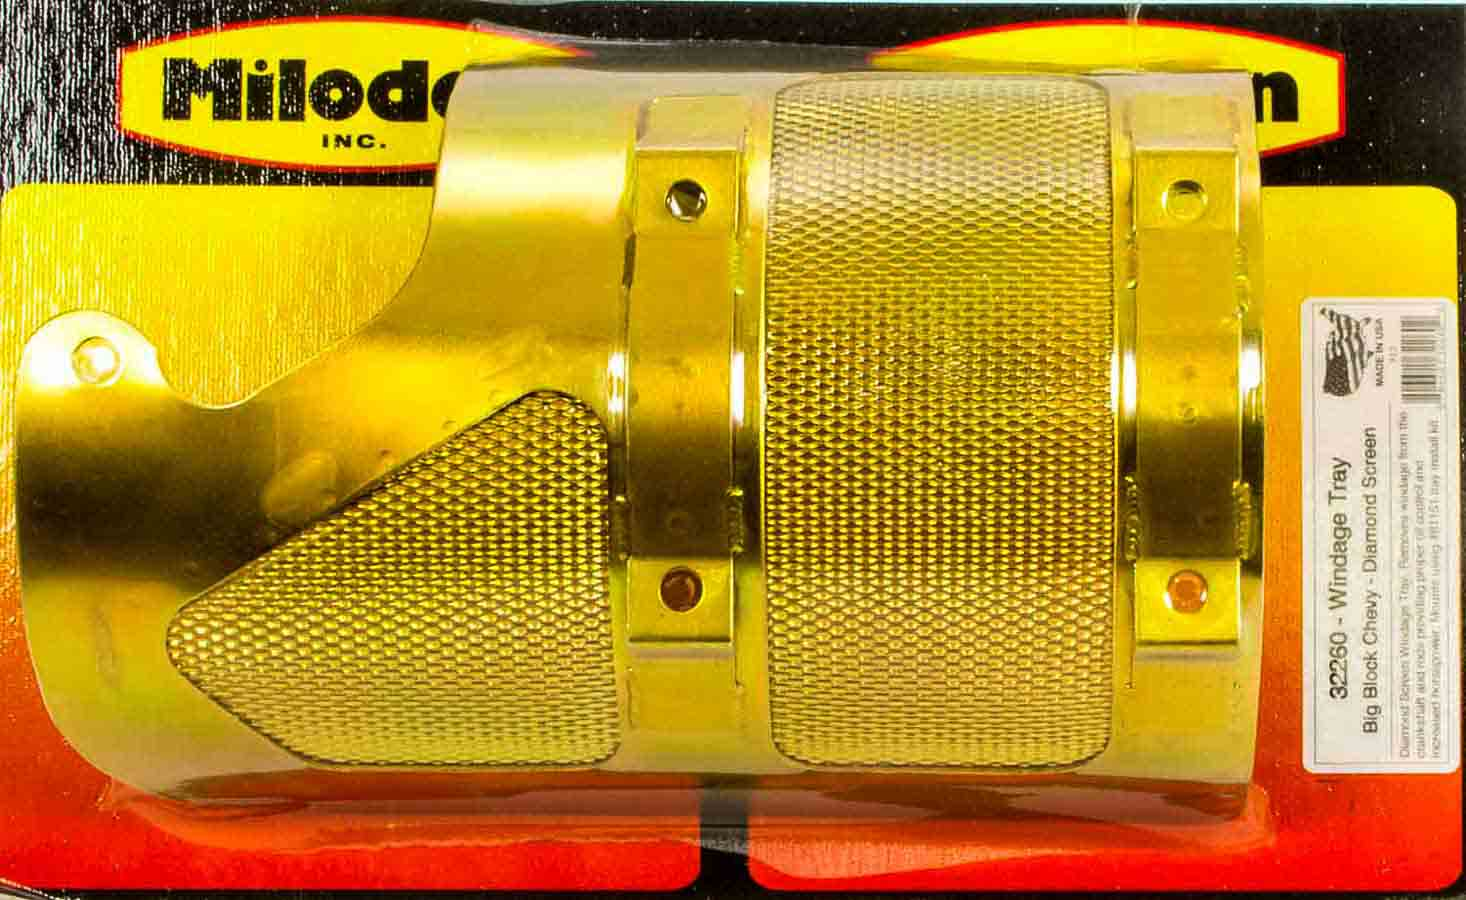 SBC 350 Windage Tray w/RH Dipstick